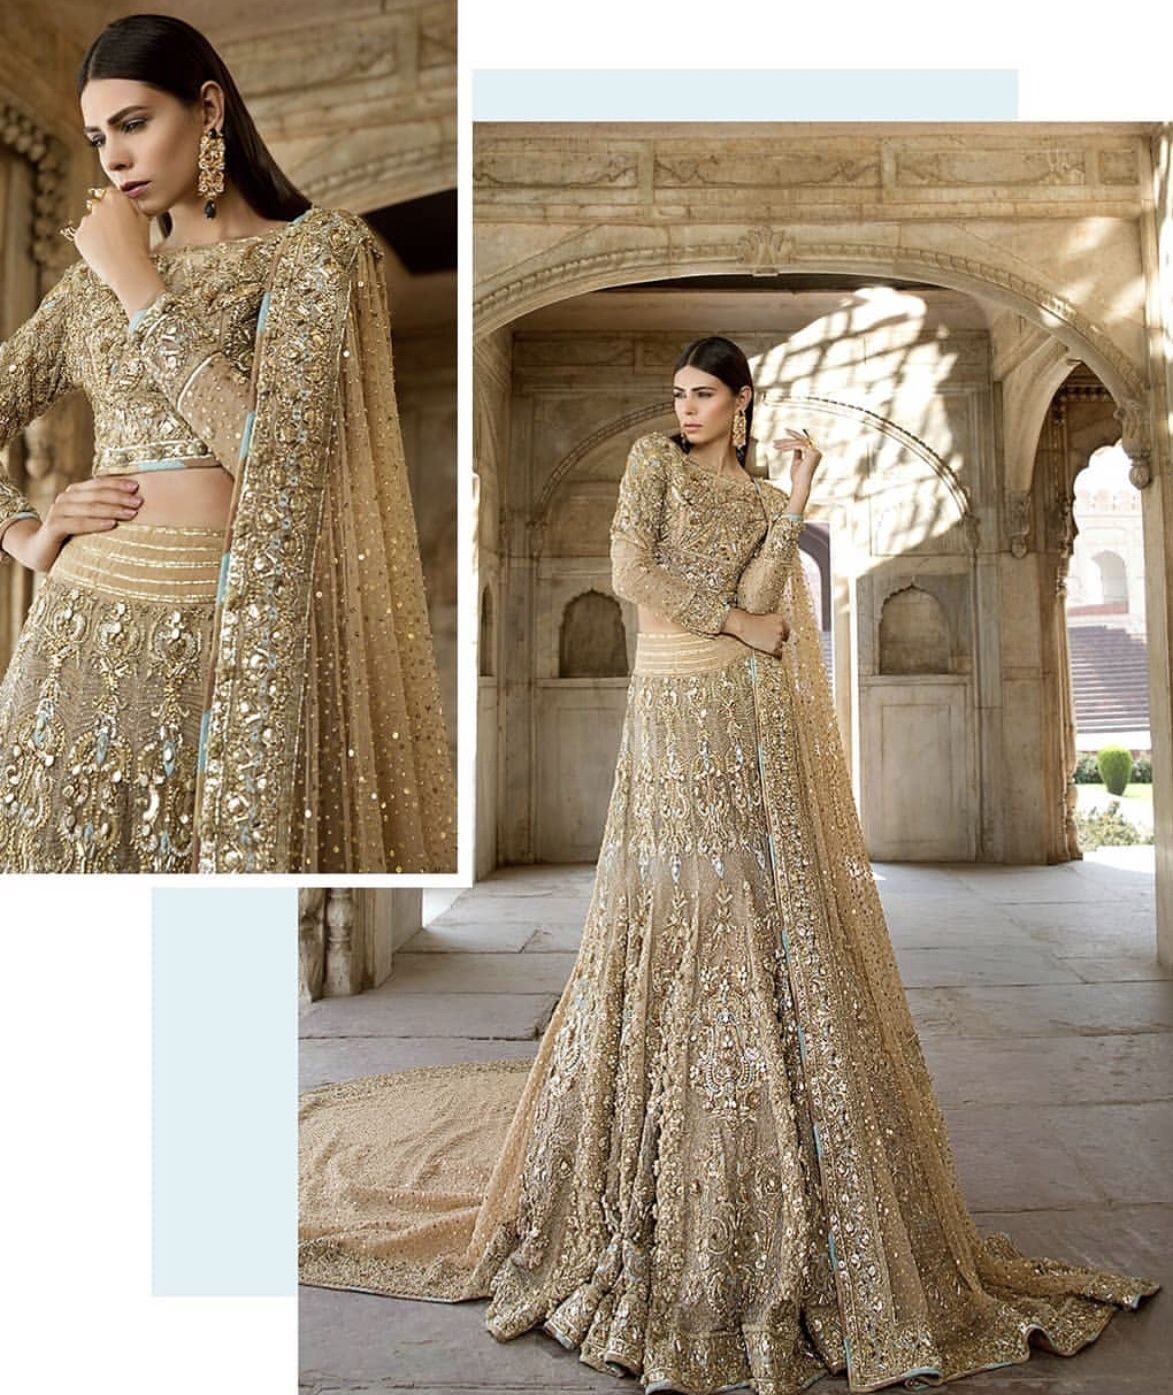 c8f4b78ab2 Indian Embroidery, Engagement Outfits, Lahenga, Pakistani Bridal, Indian  Designer Wear, Bridal